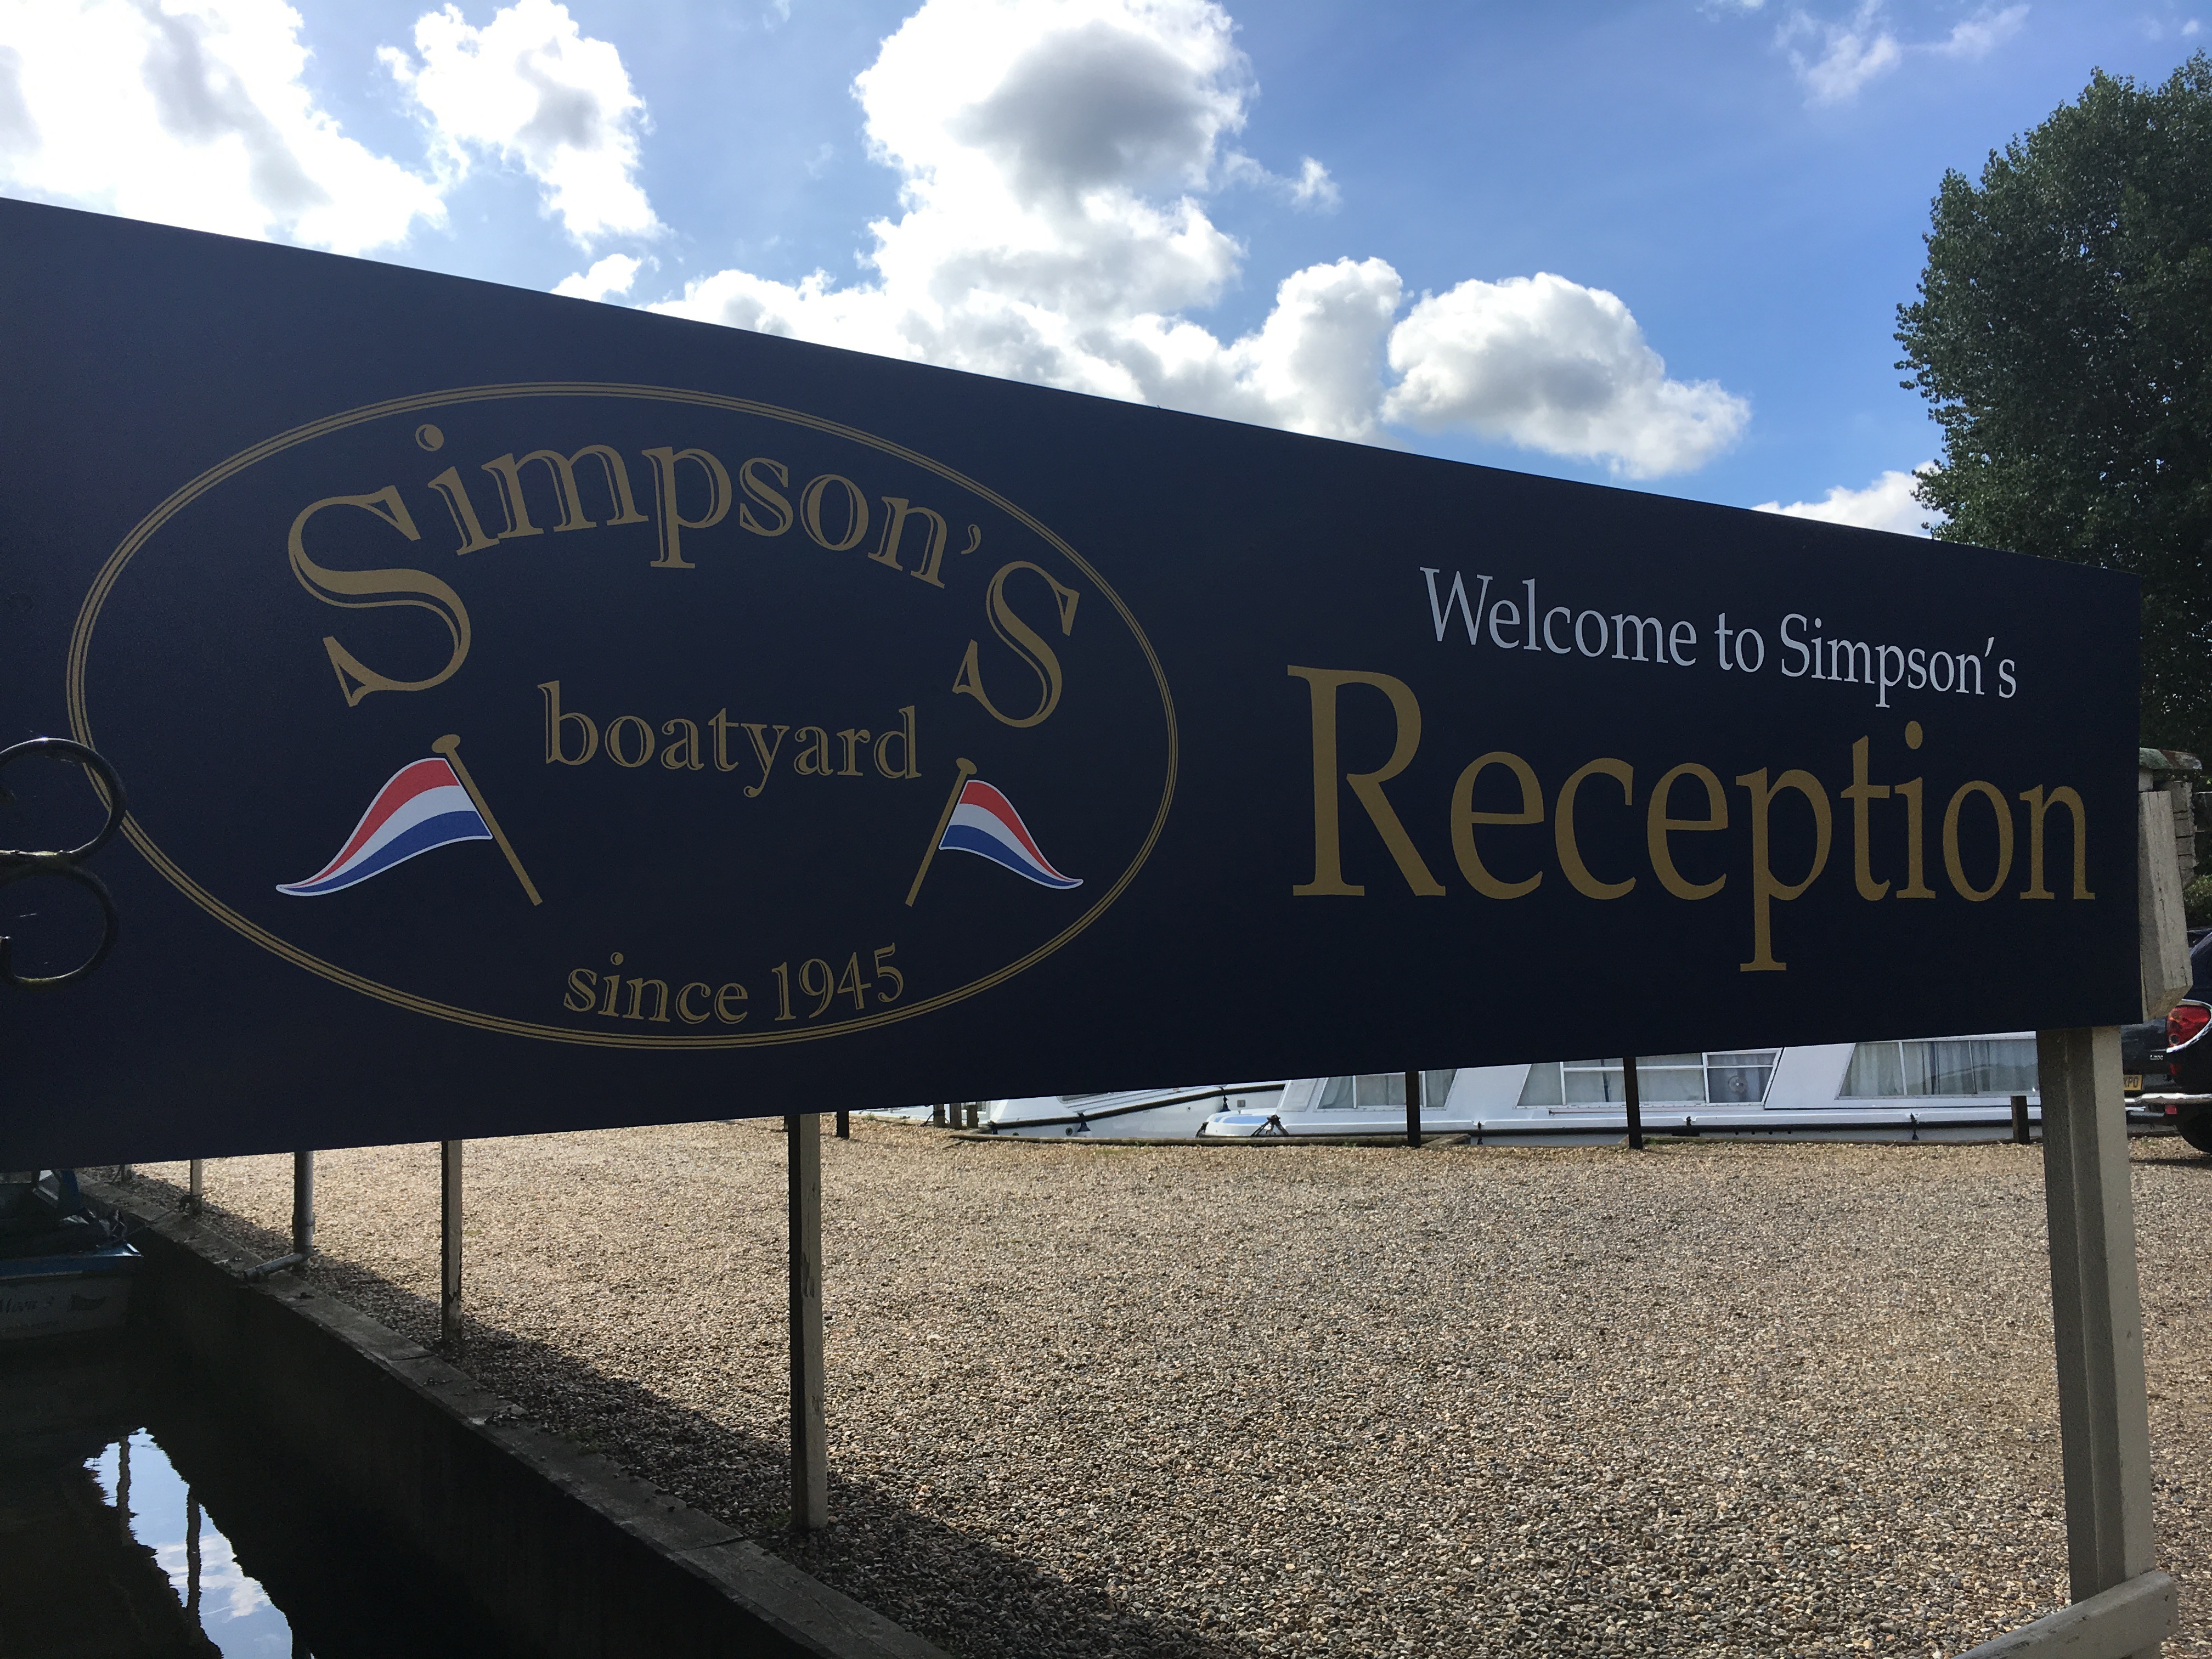 Simpson's Boatyard